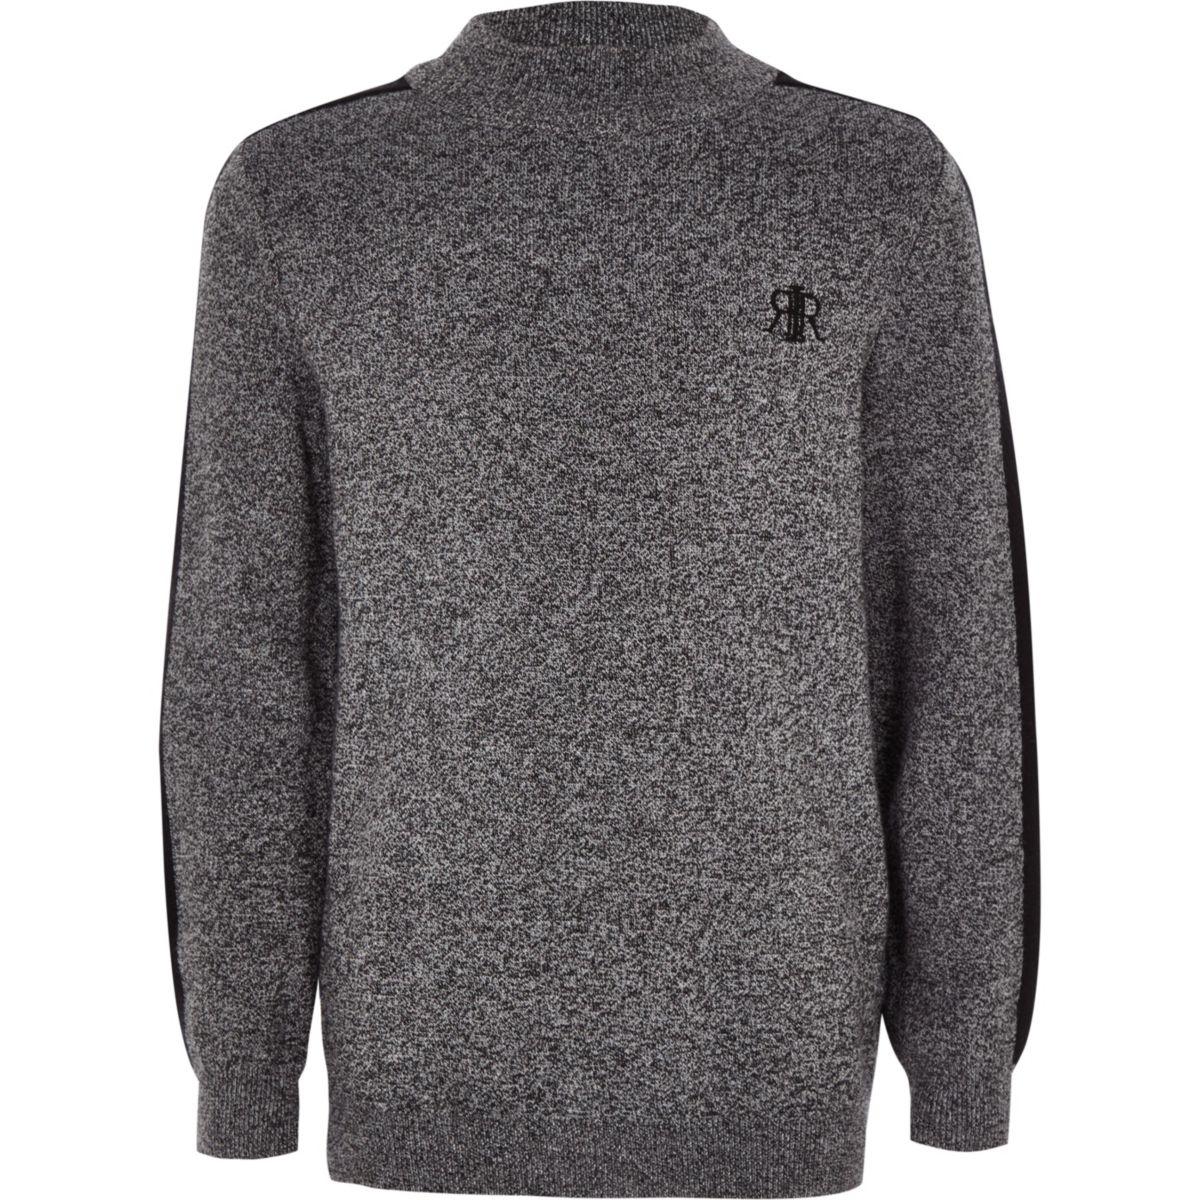 Boys grey knit high neck sweater